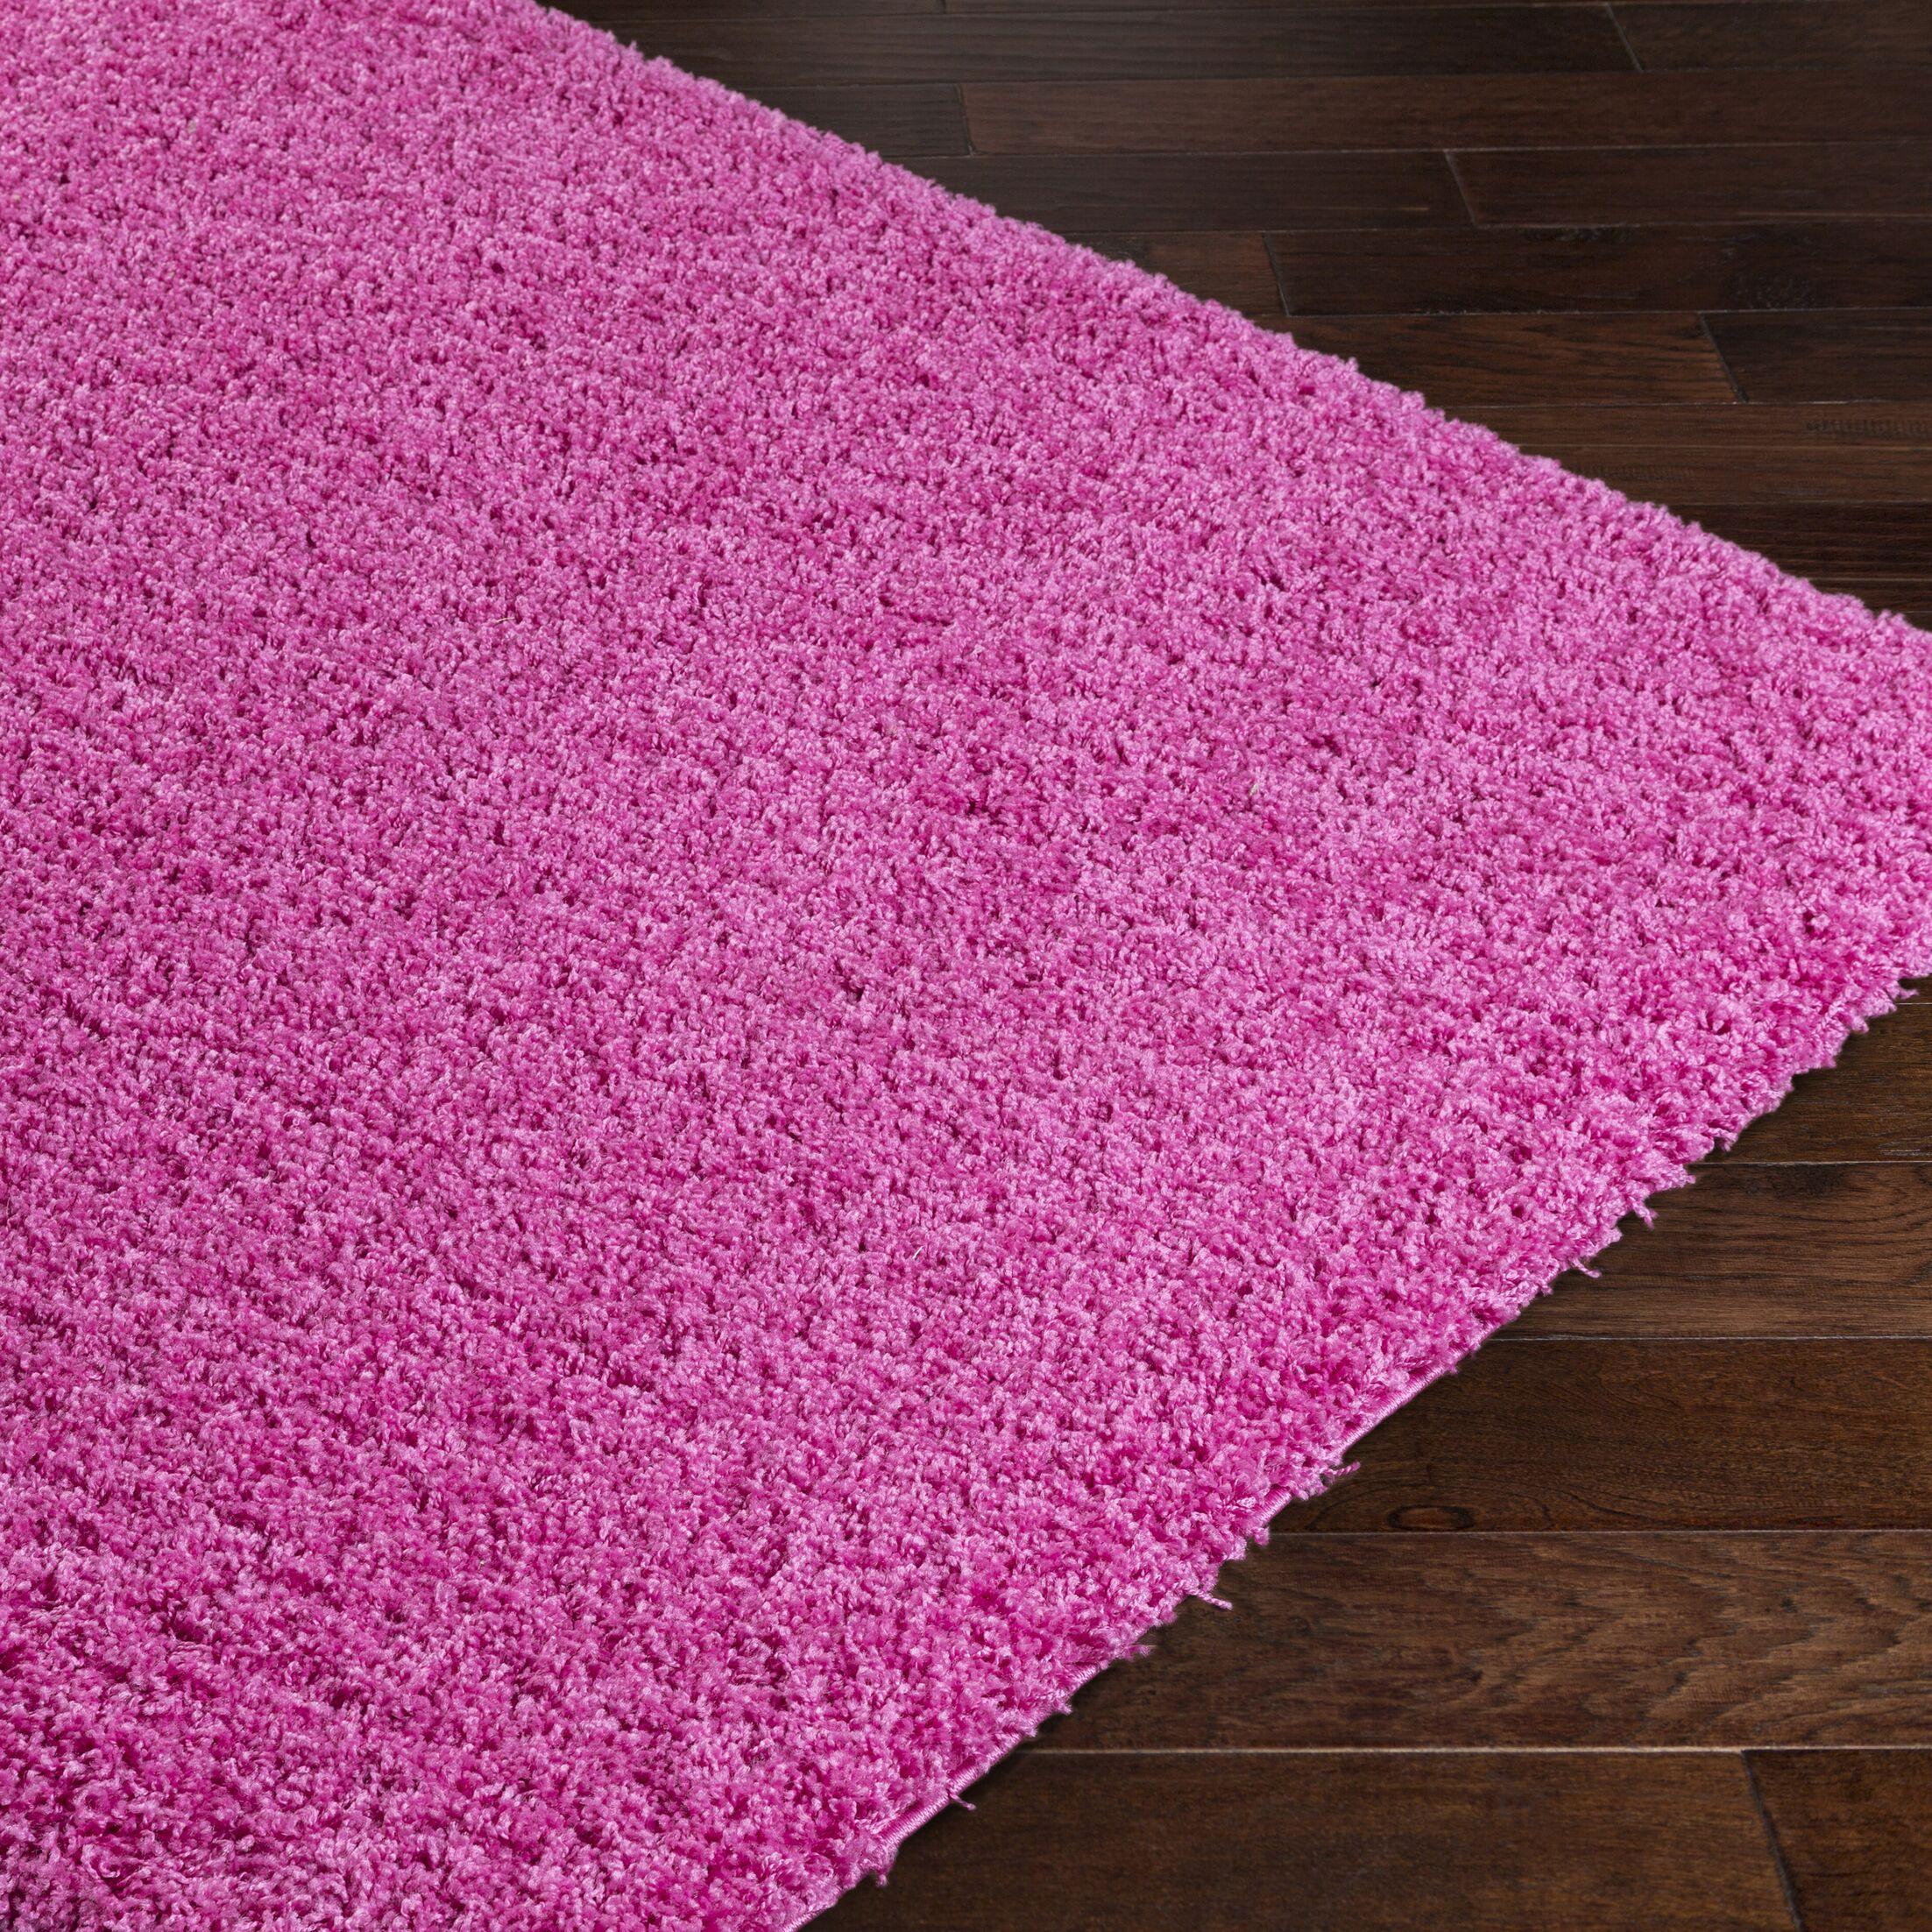 Roberto Pink Area Rug Rug Size: Rectangle 7'10